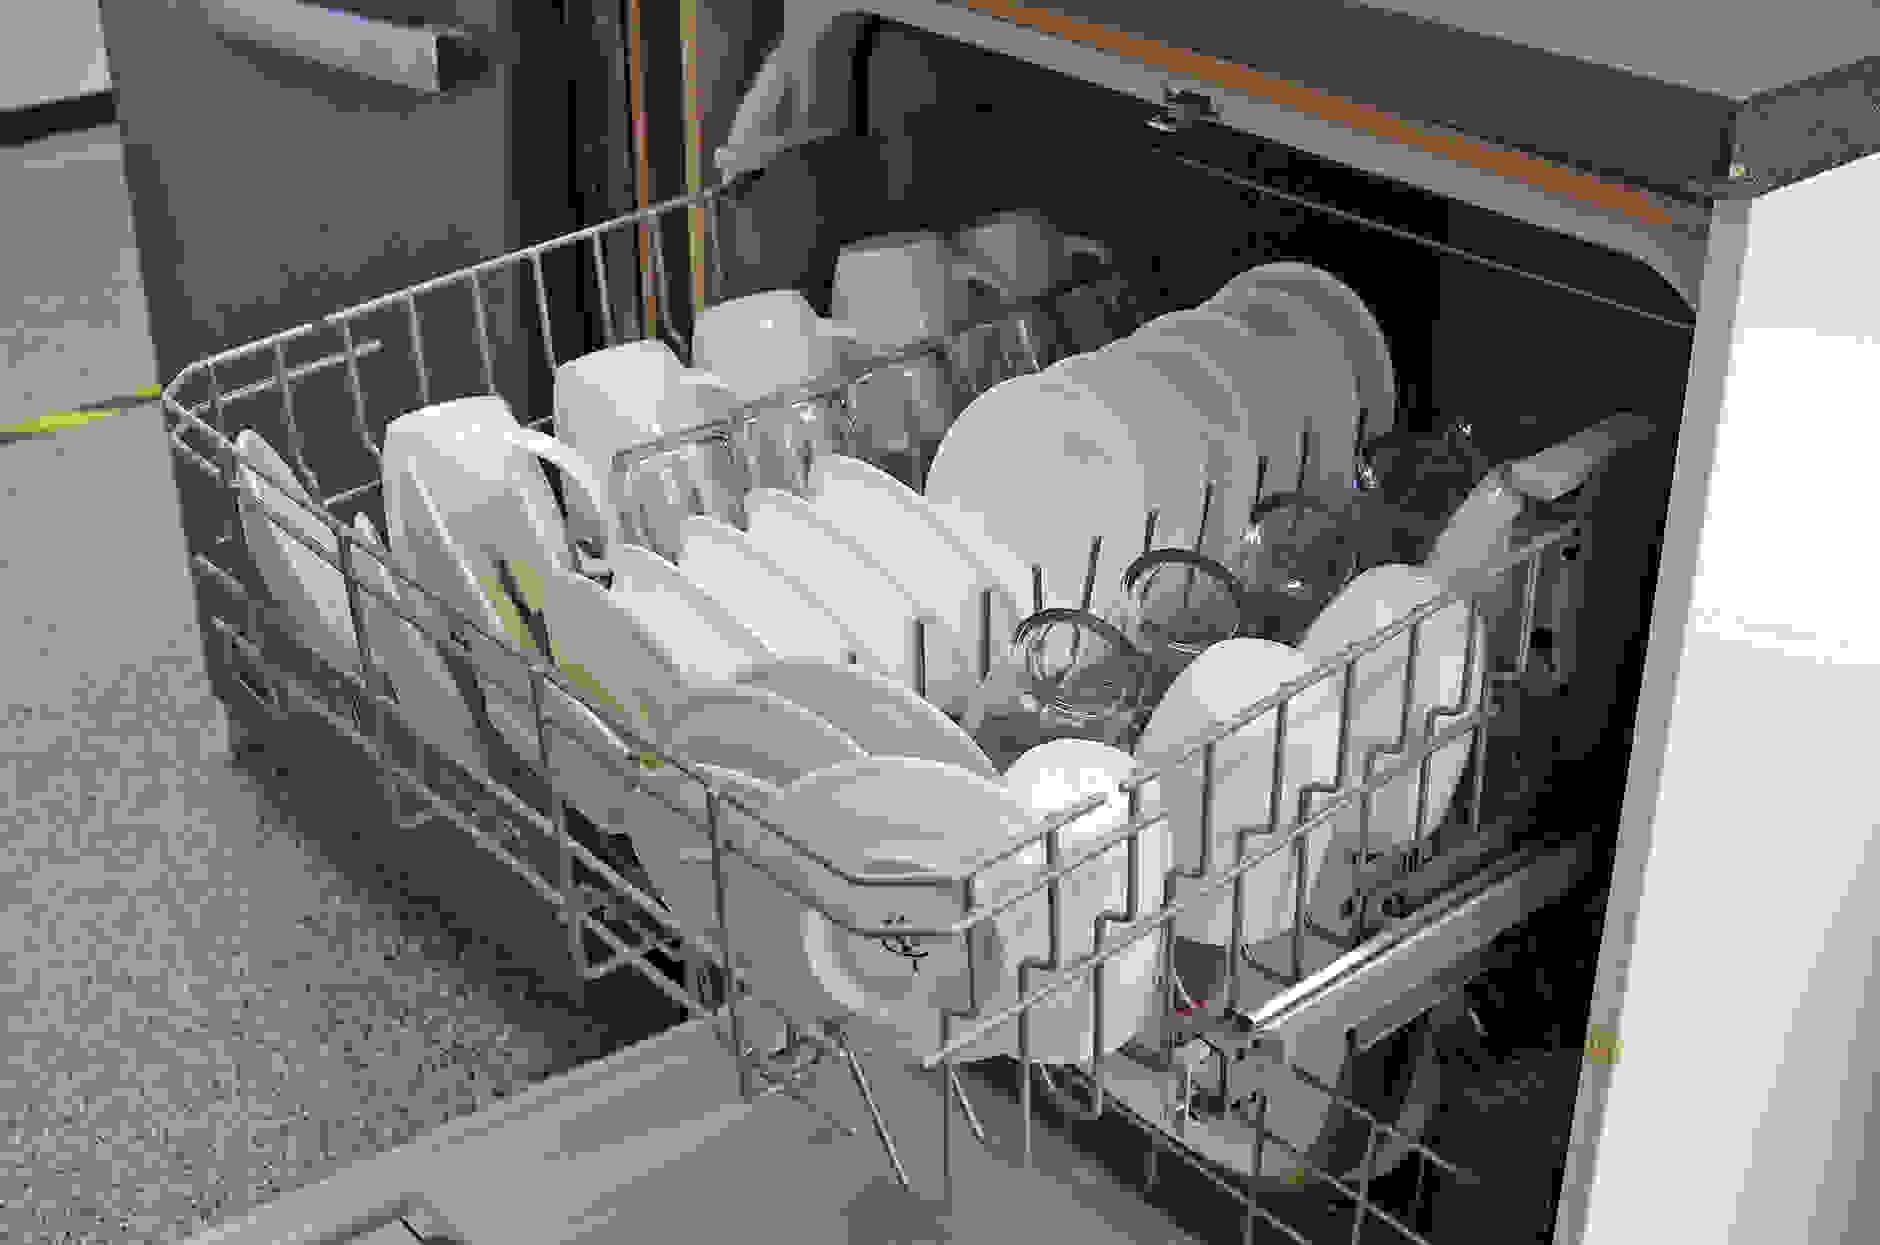 Kenmore 13042 upper rack loaded